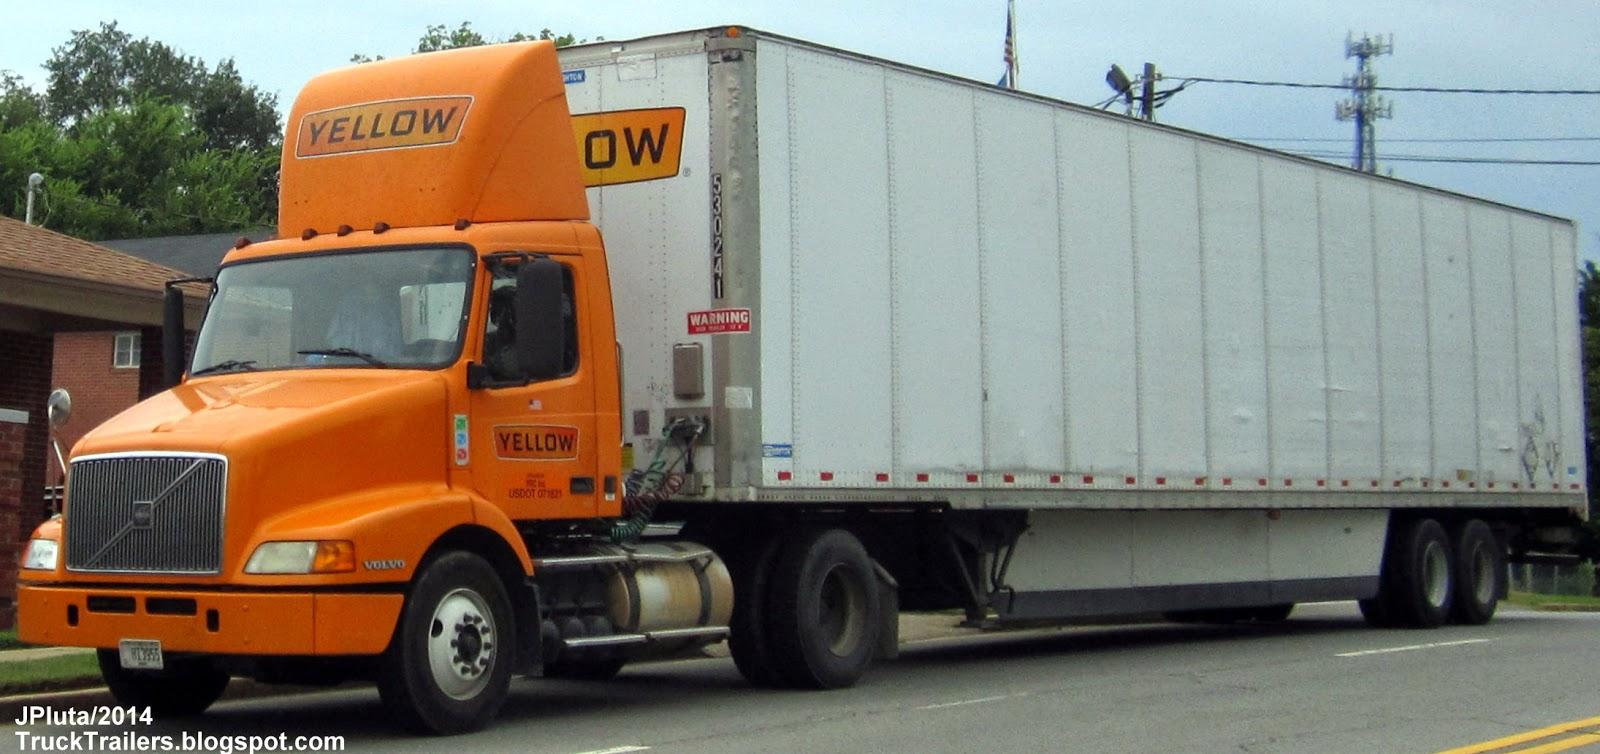 Filename yrc yellow roadway trucking company volvo day cab truck stoughton dry van trailer jacksonville florida yrc yellow roadway jax fl jpg